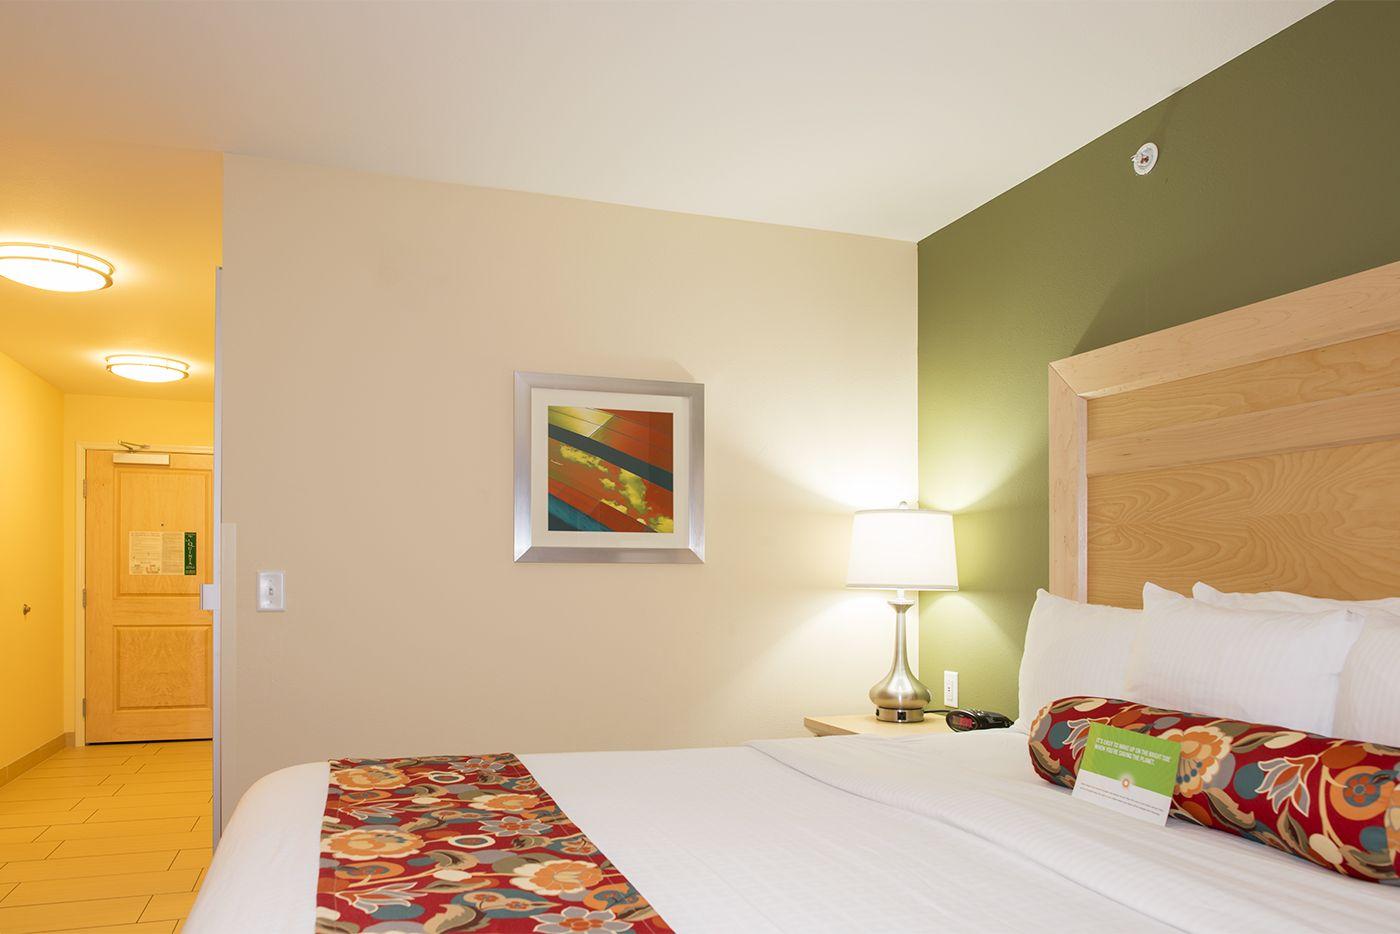 Framed Print A The La Quinta Inn U0026 Suites In Rochester, MN #framedprint #